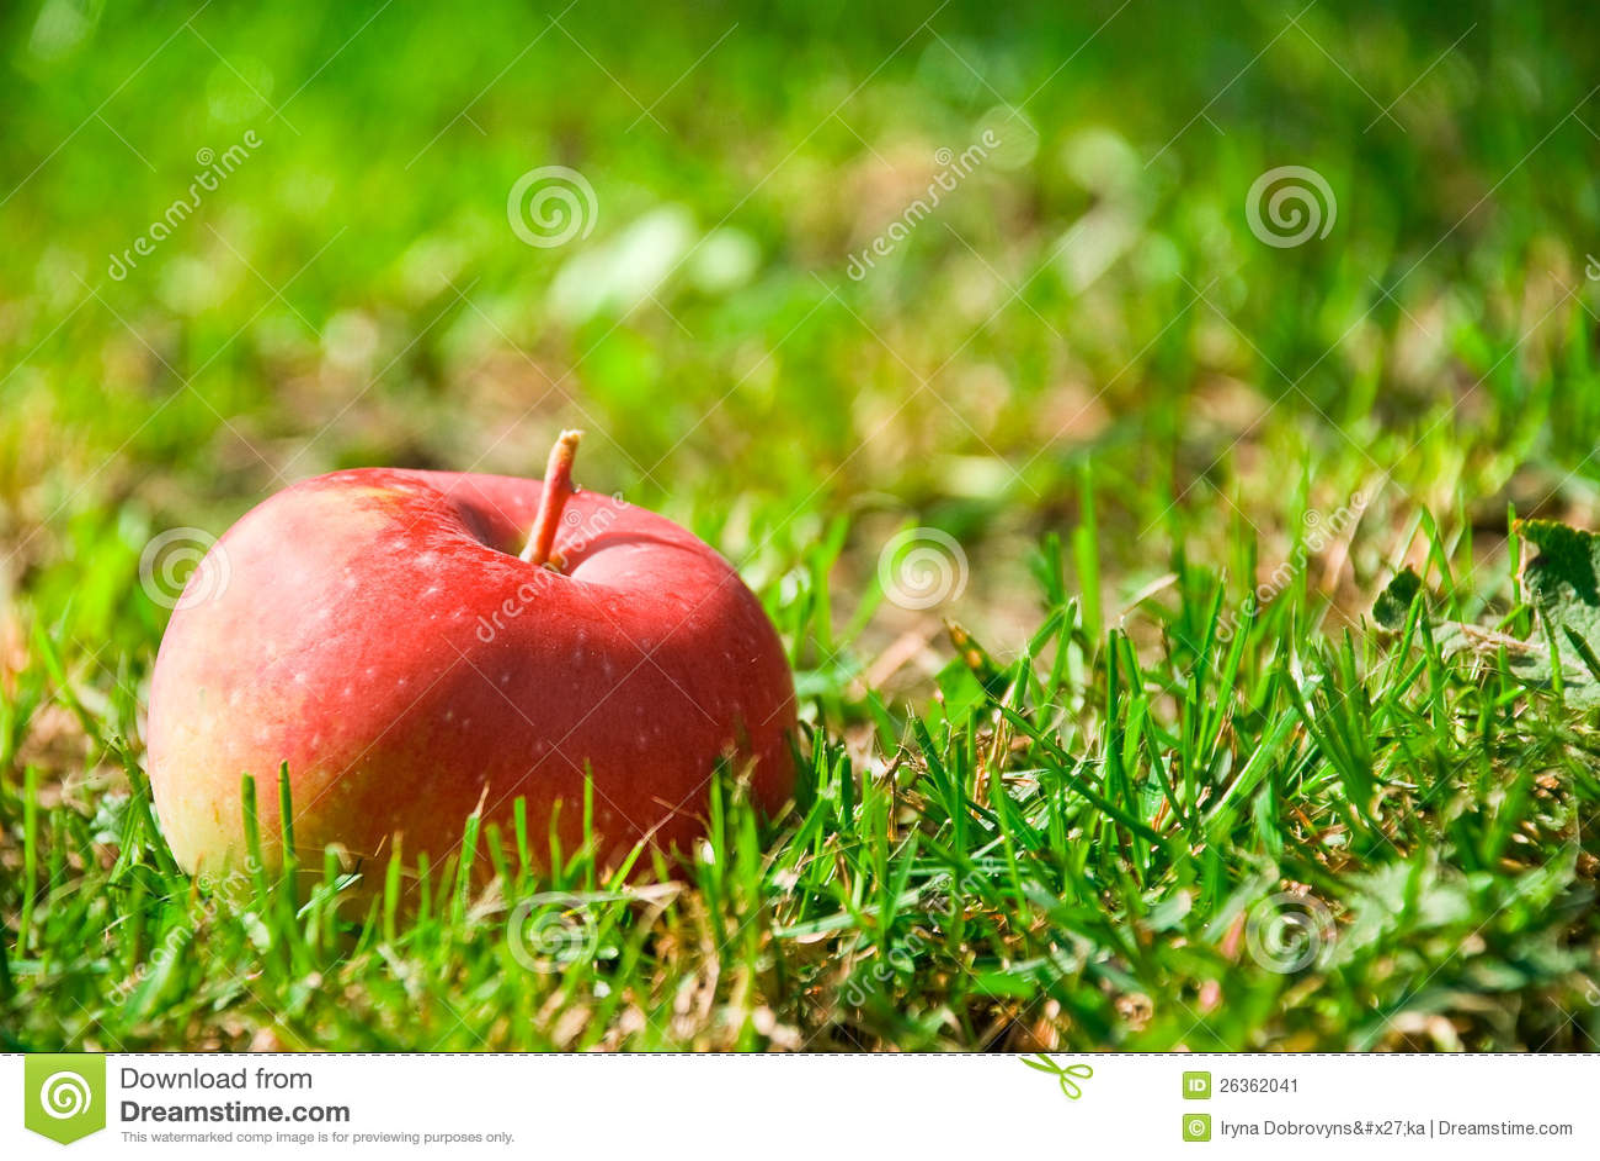 Sunt rött äpple